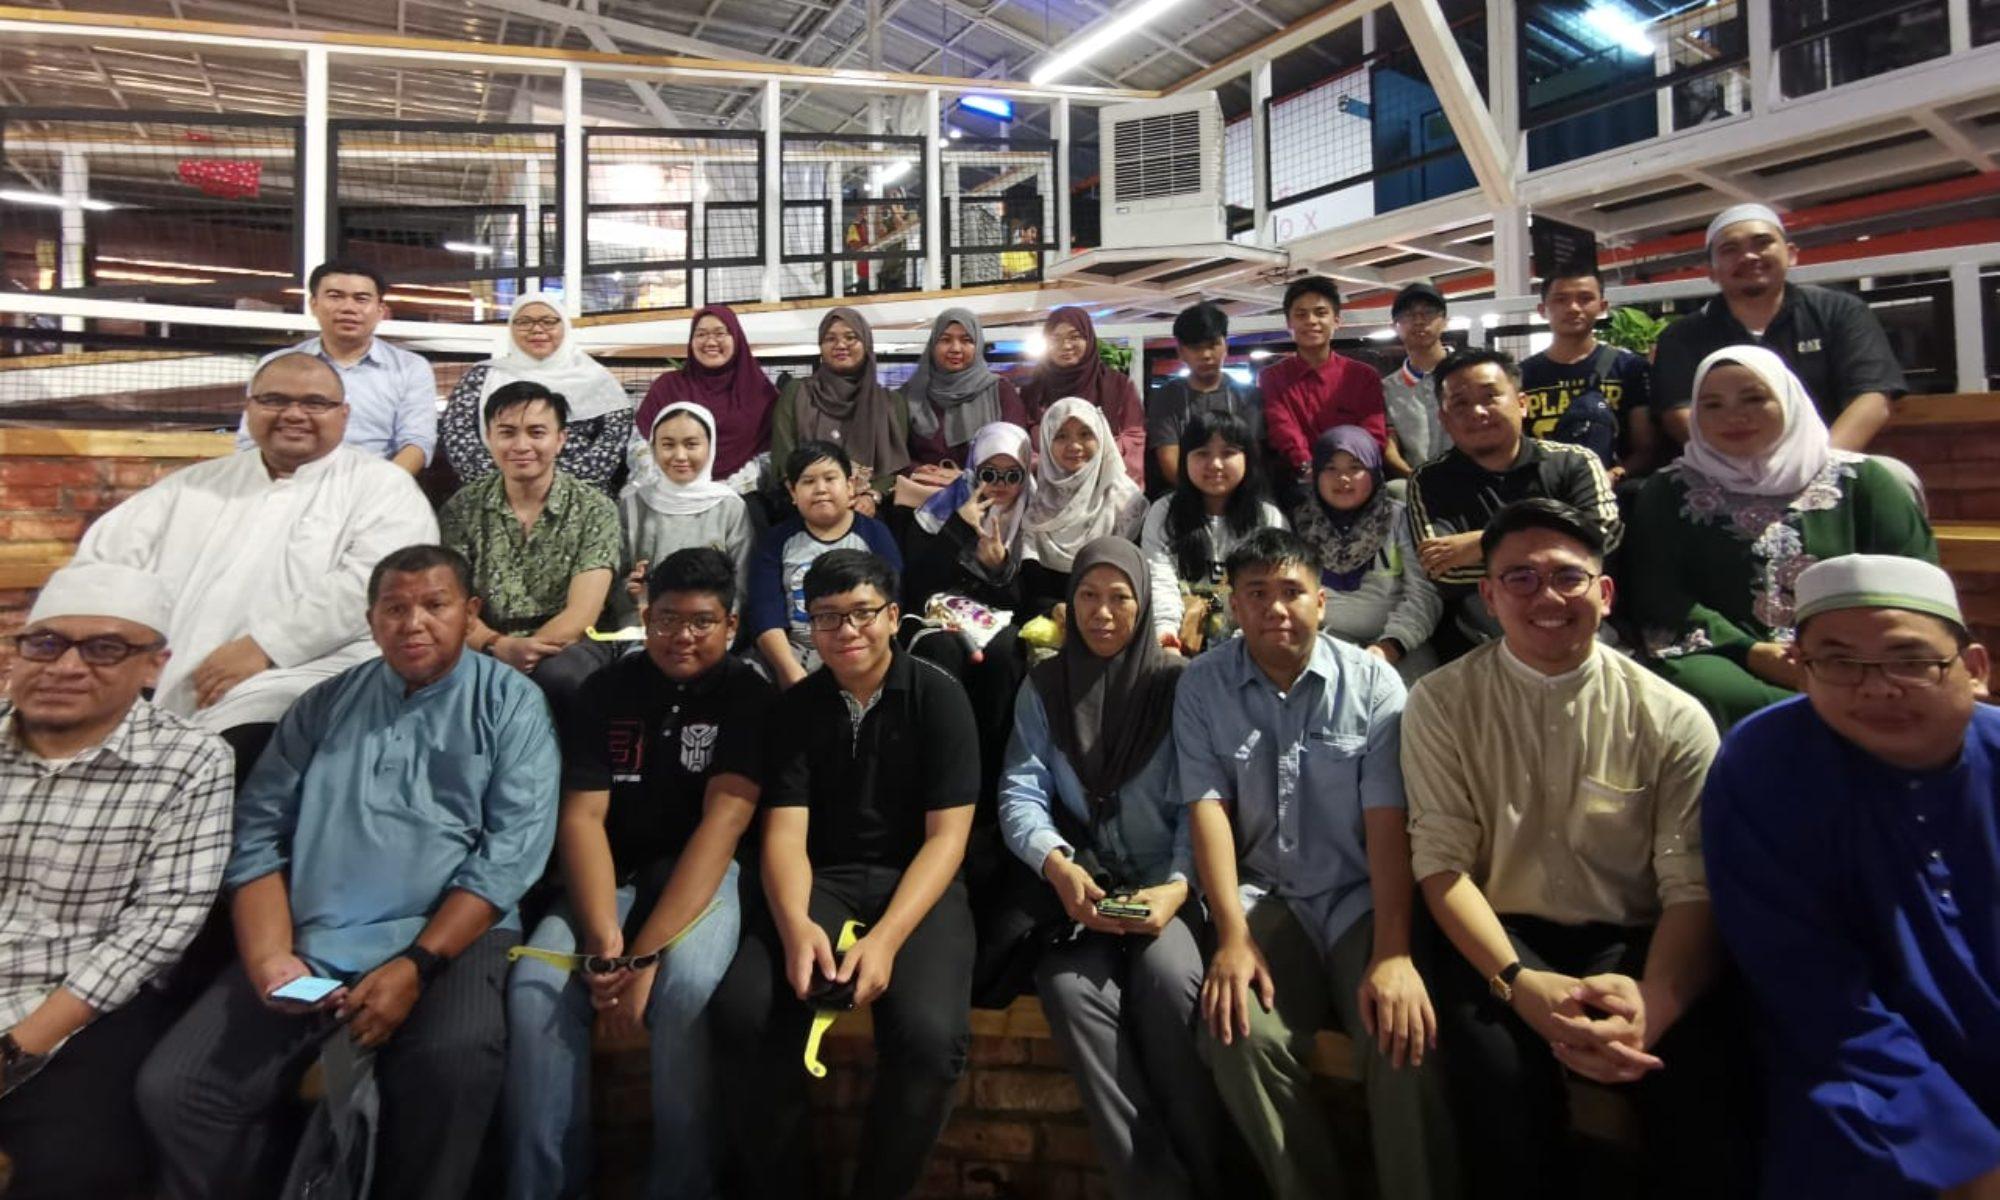 Bruneiastronomy.org